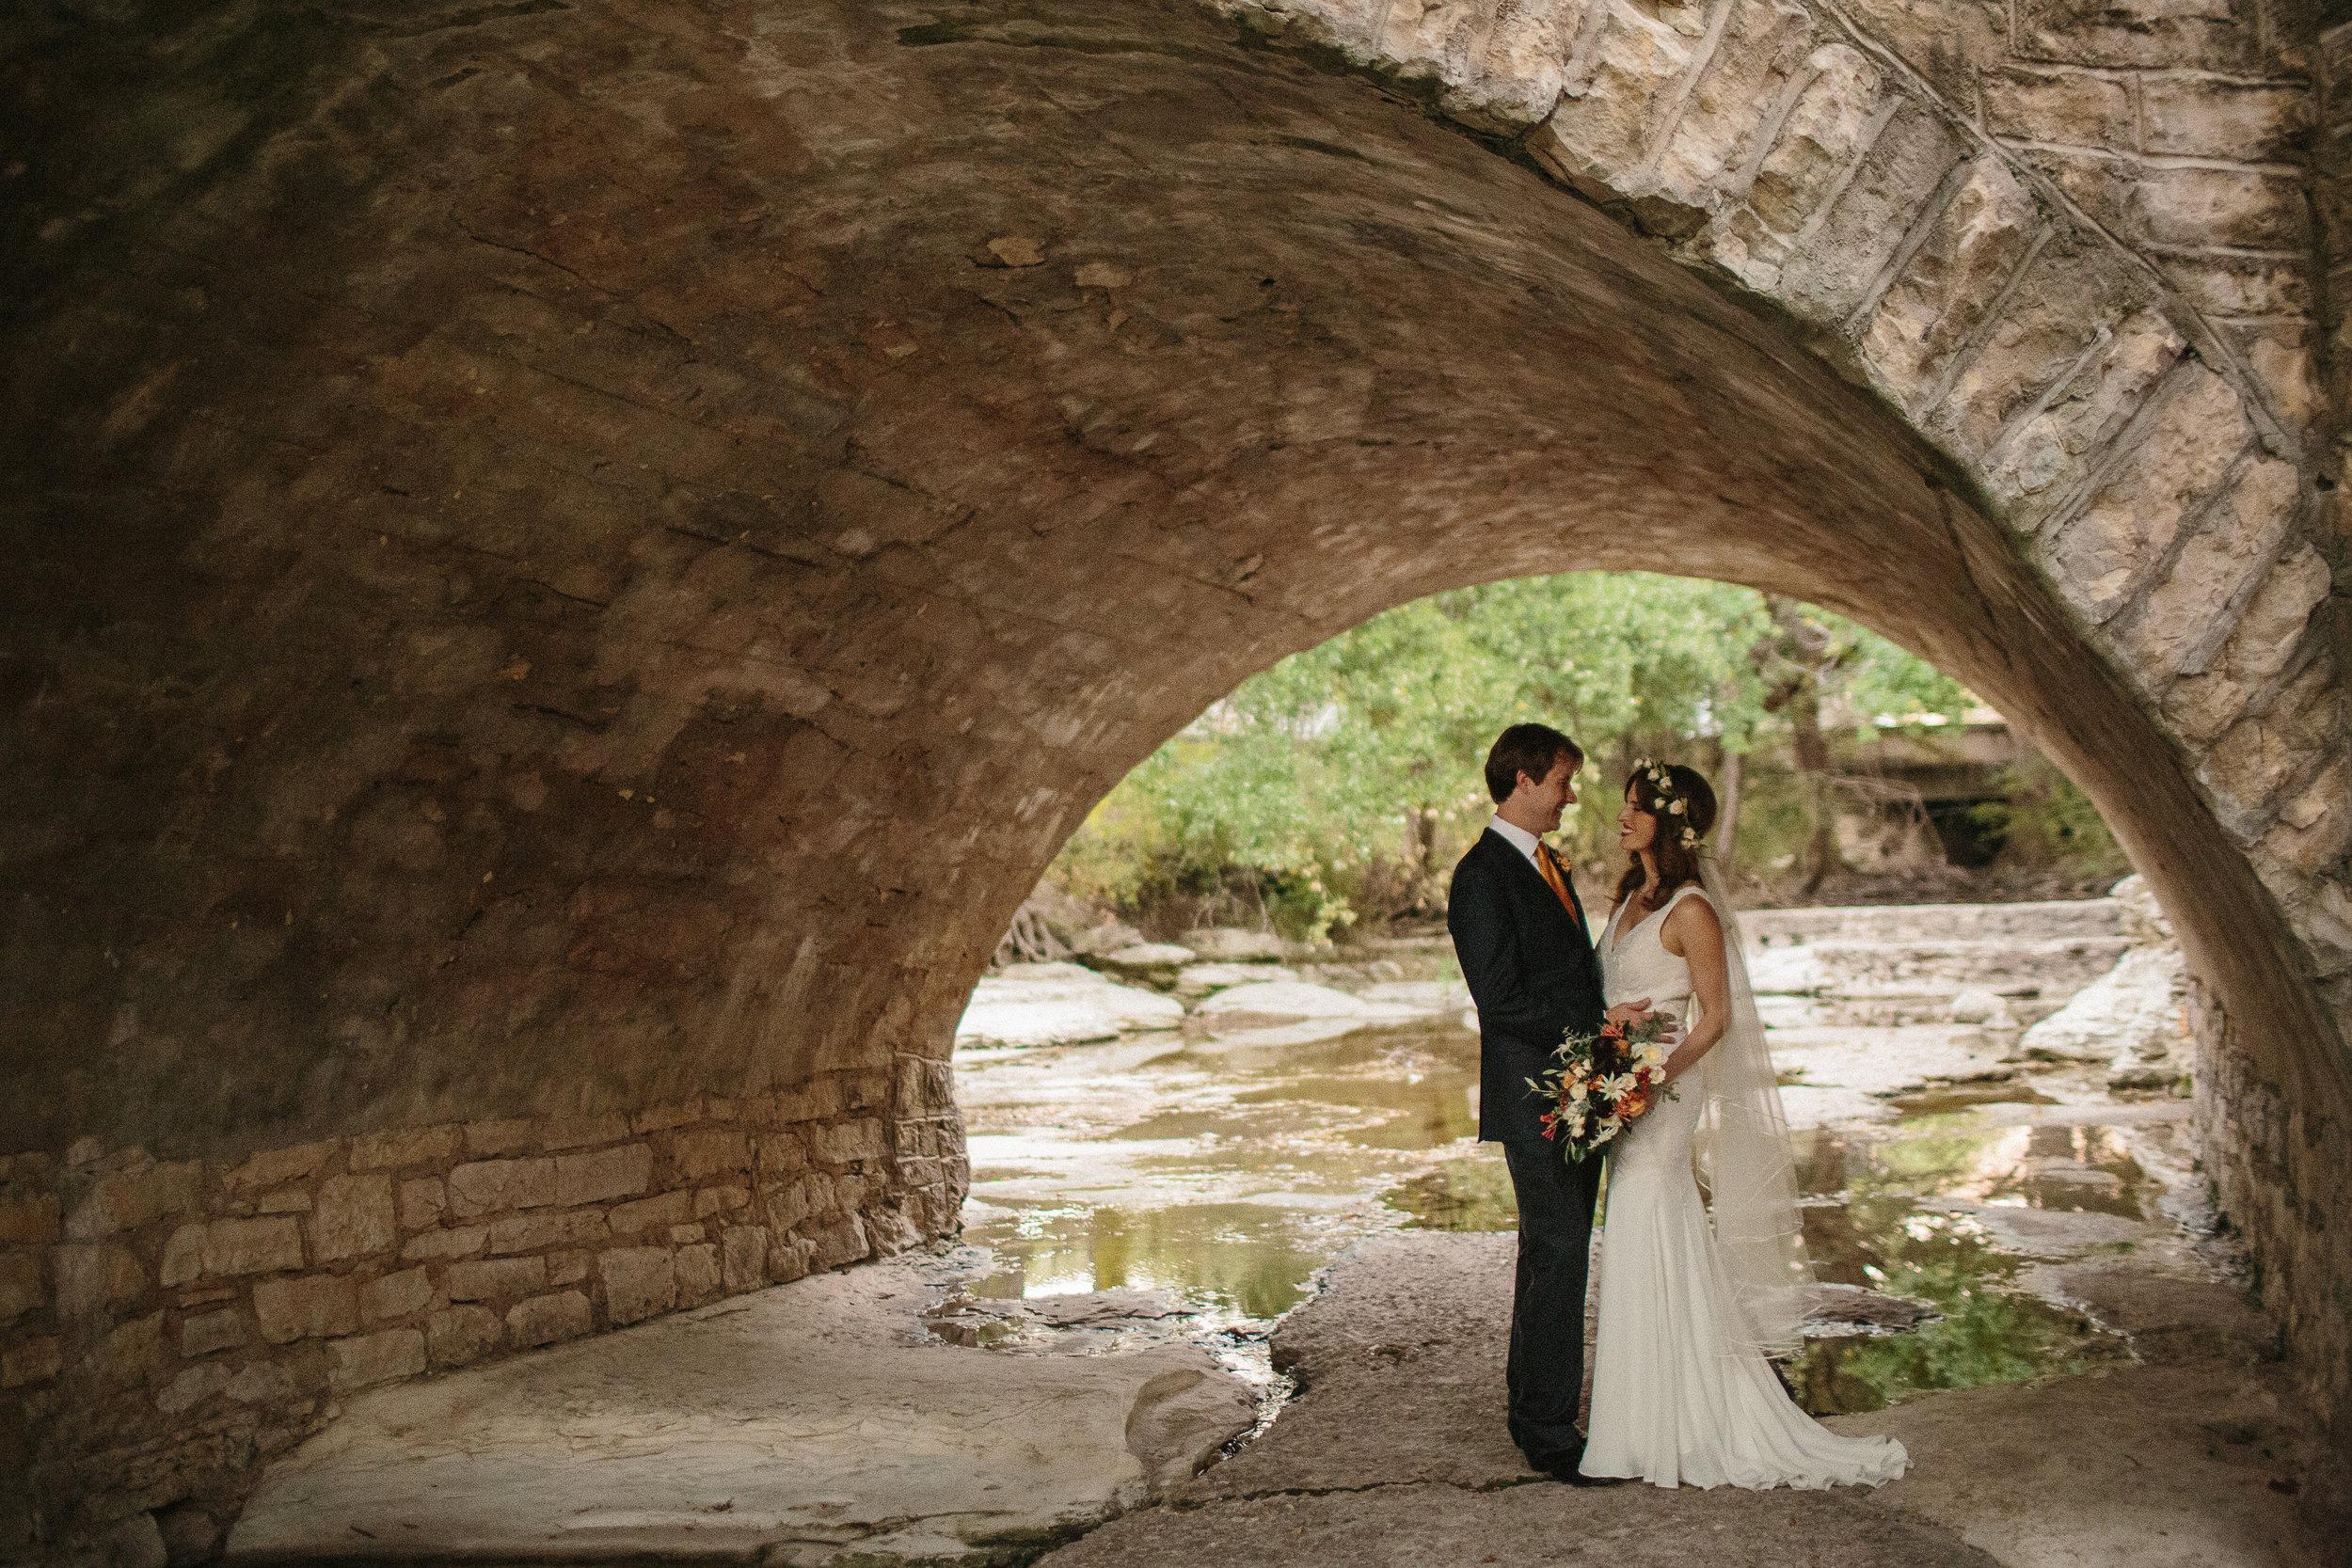 bride and groom under bridge by waller creek